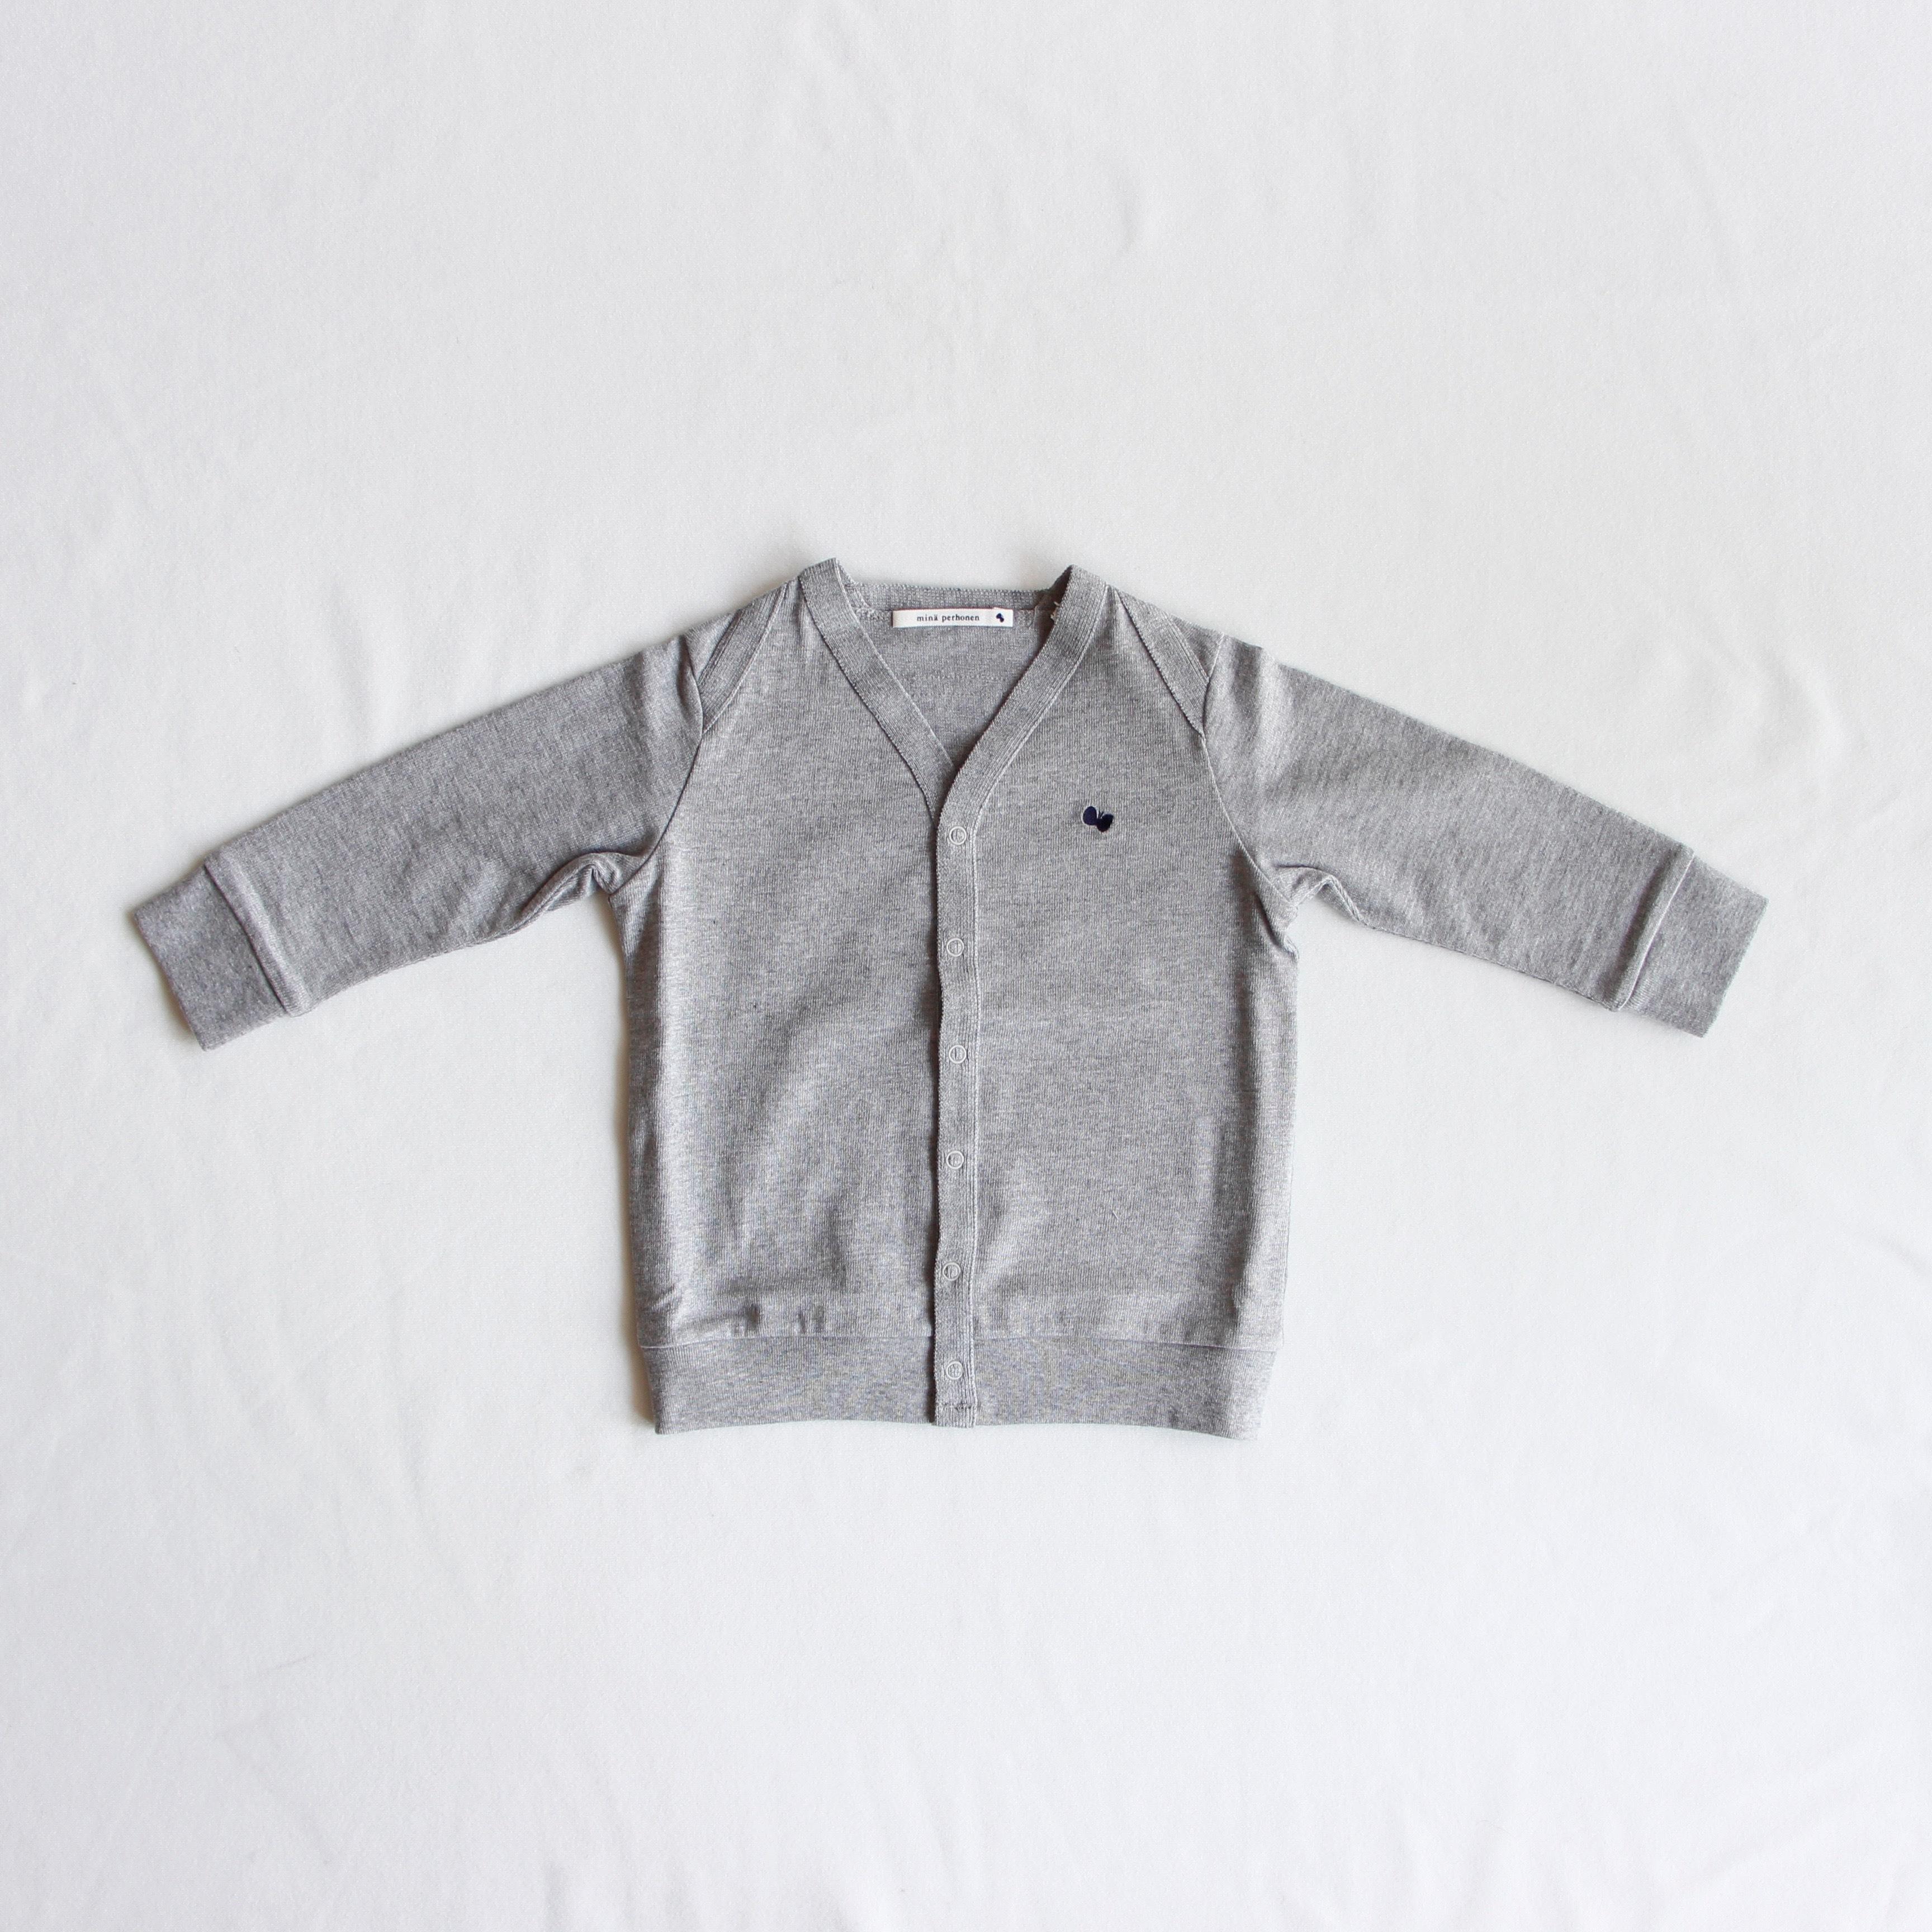 《mina perhonen》zutto カーディガン / gray / 80-100cm